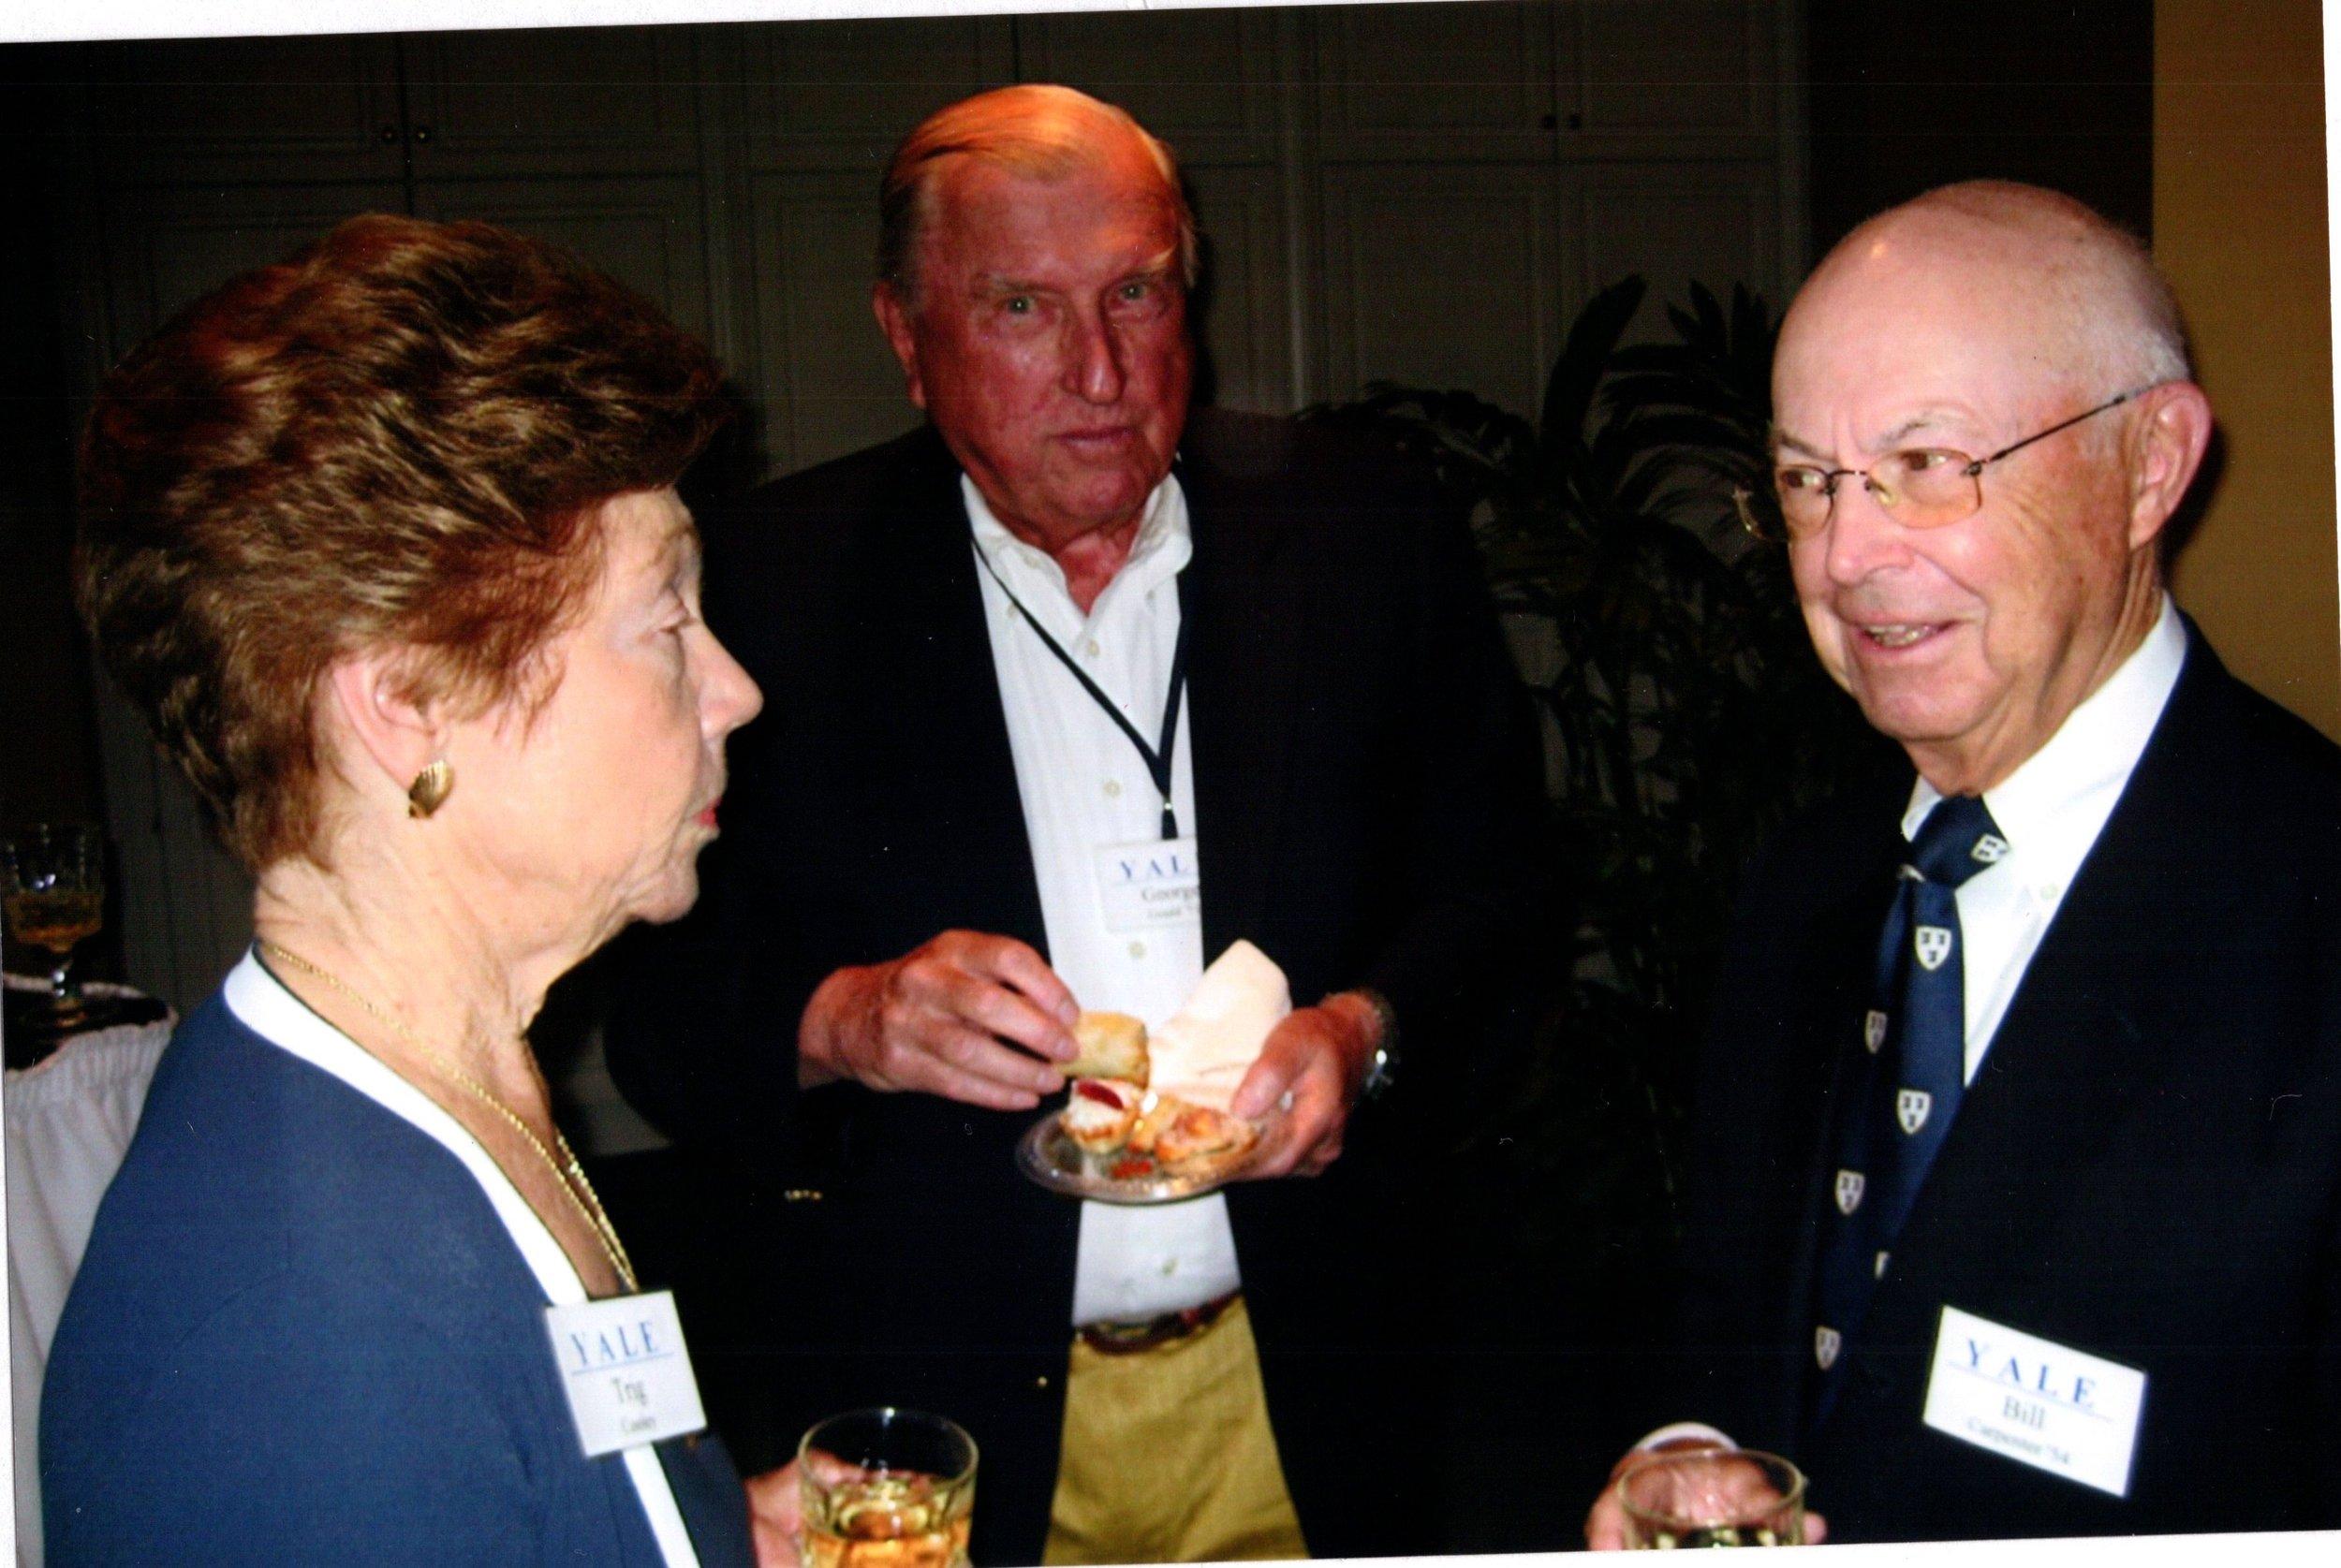 TRIGG COOLEY, GEORGE GOULD, BILL CARPENTER